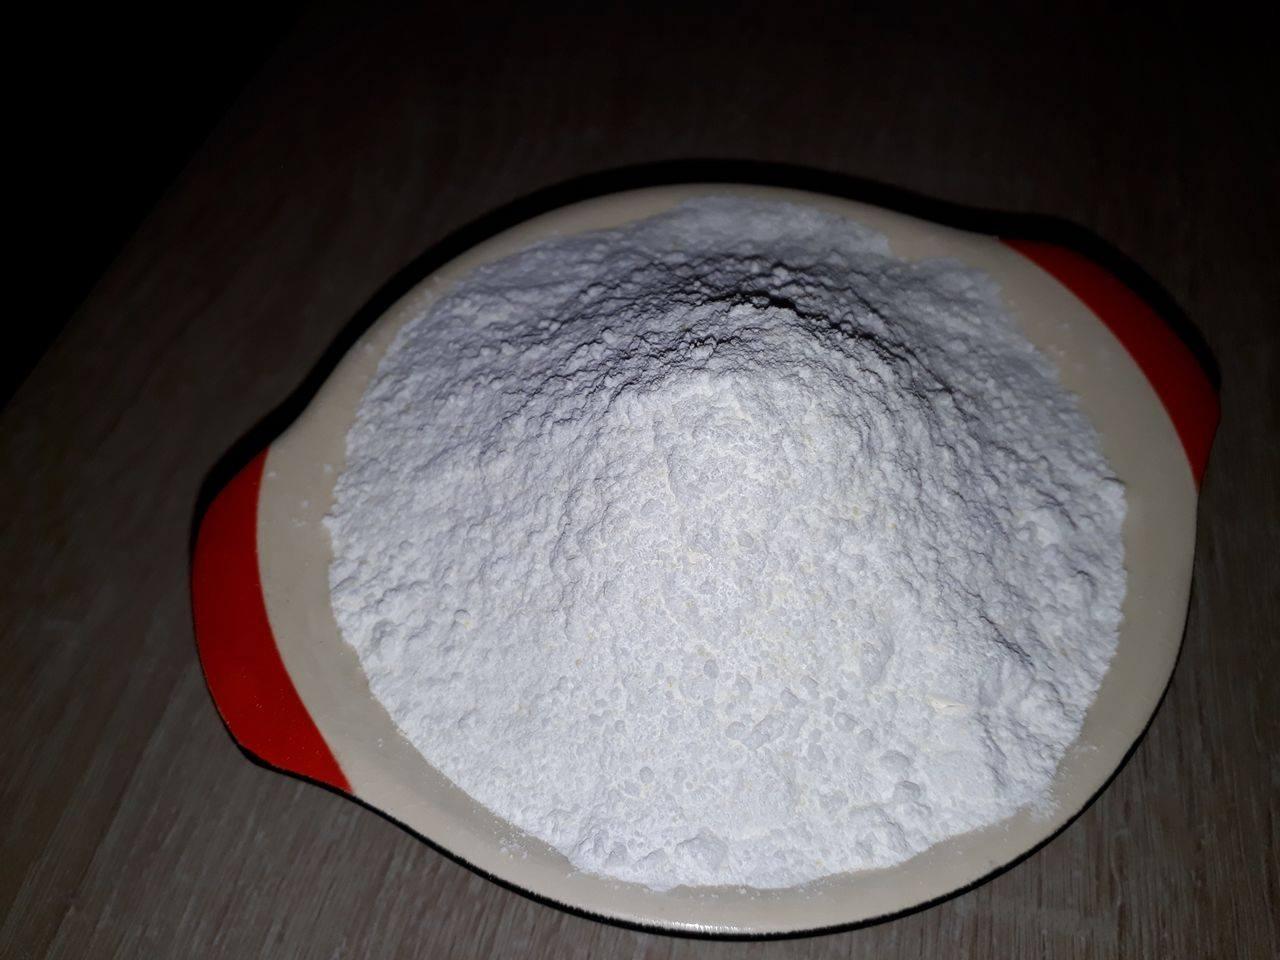 How to make powdered sugar, powdered sugar, powdered sugar glaze, powdered sugar substitute, powdered sugar frosting, powdered sugar icing, confectioners sugar, icing sugar